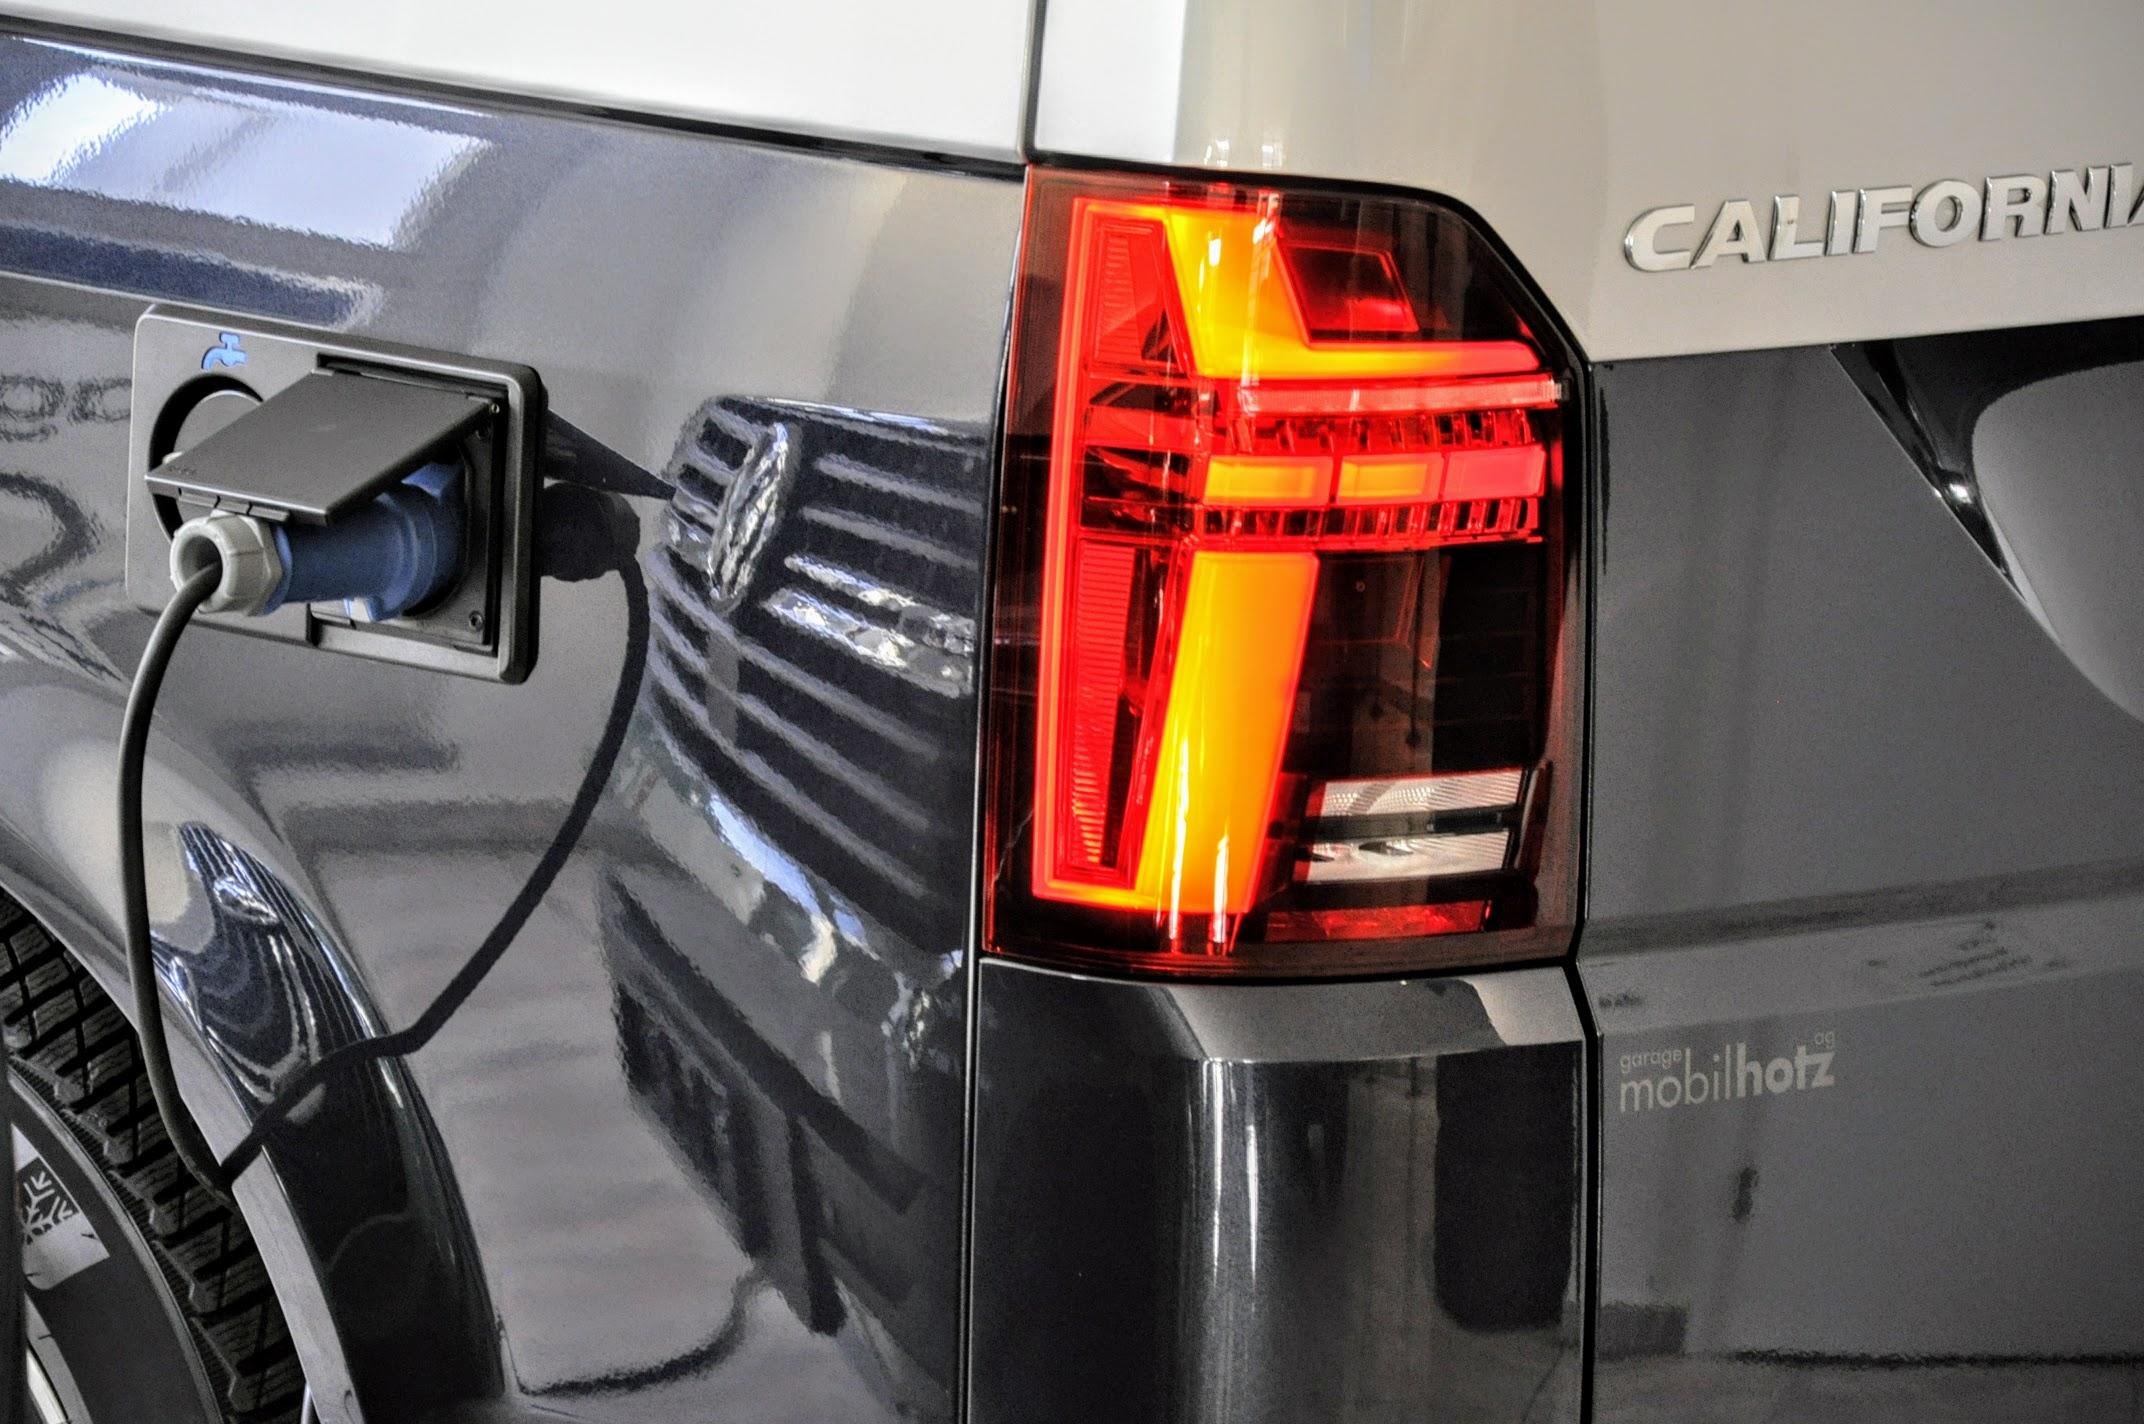 VW T6.1 California beim laden